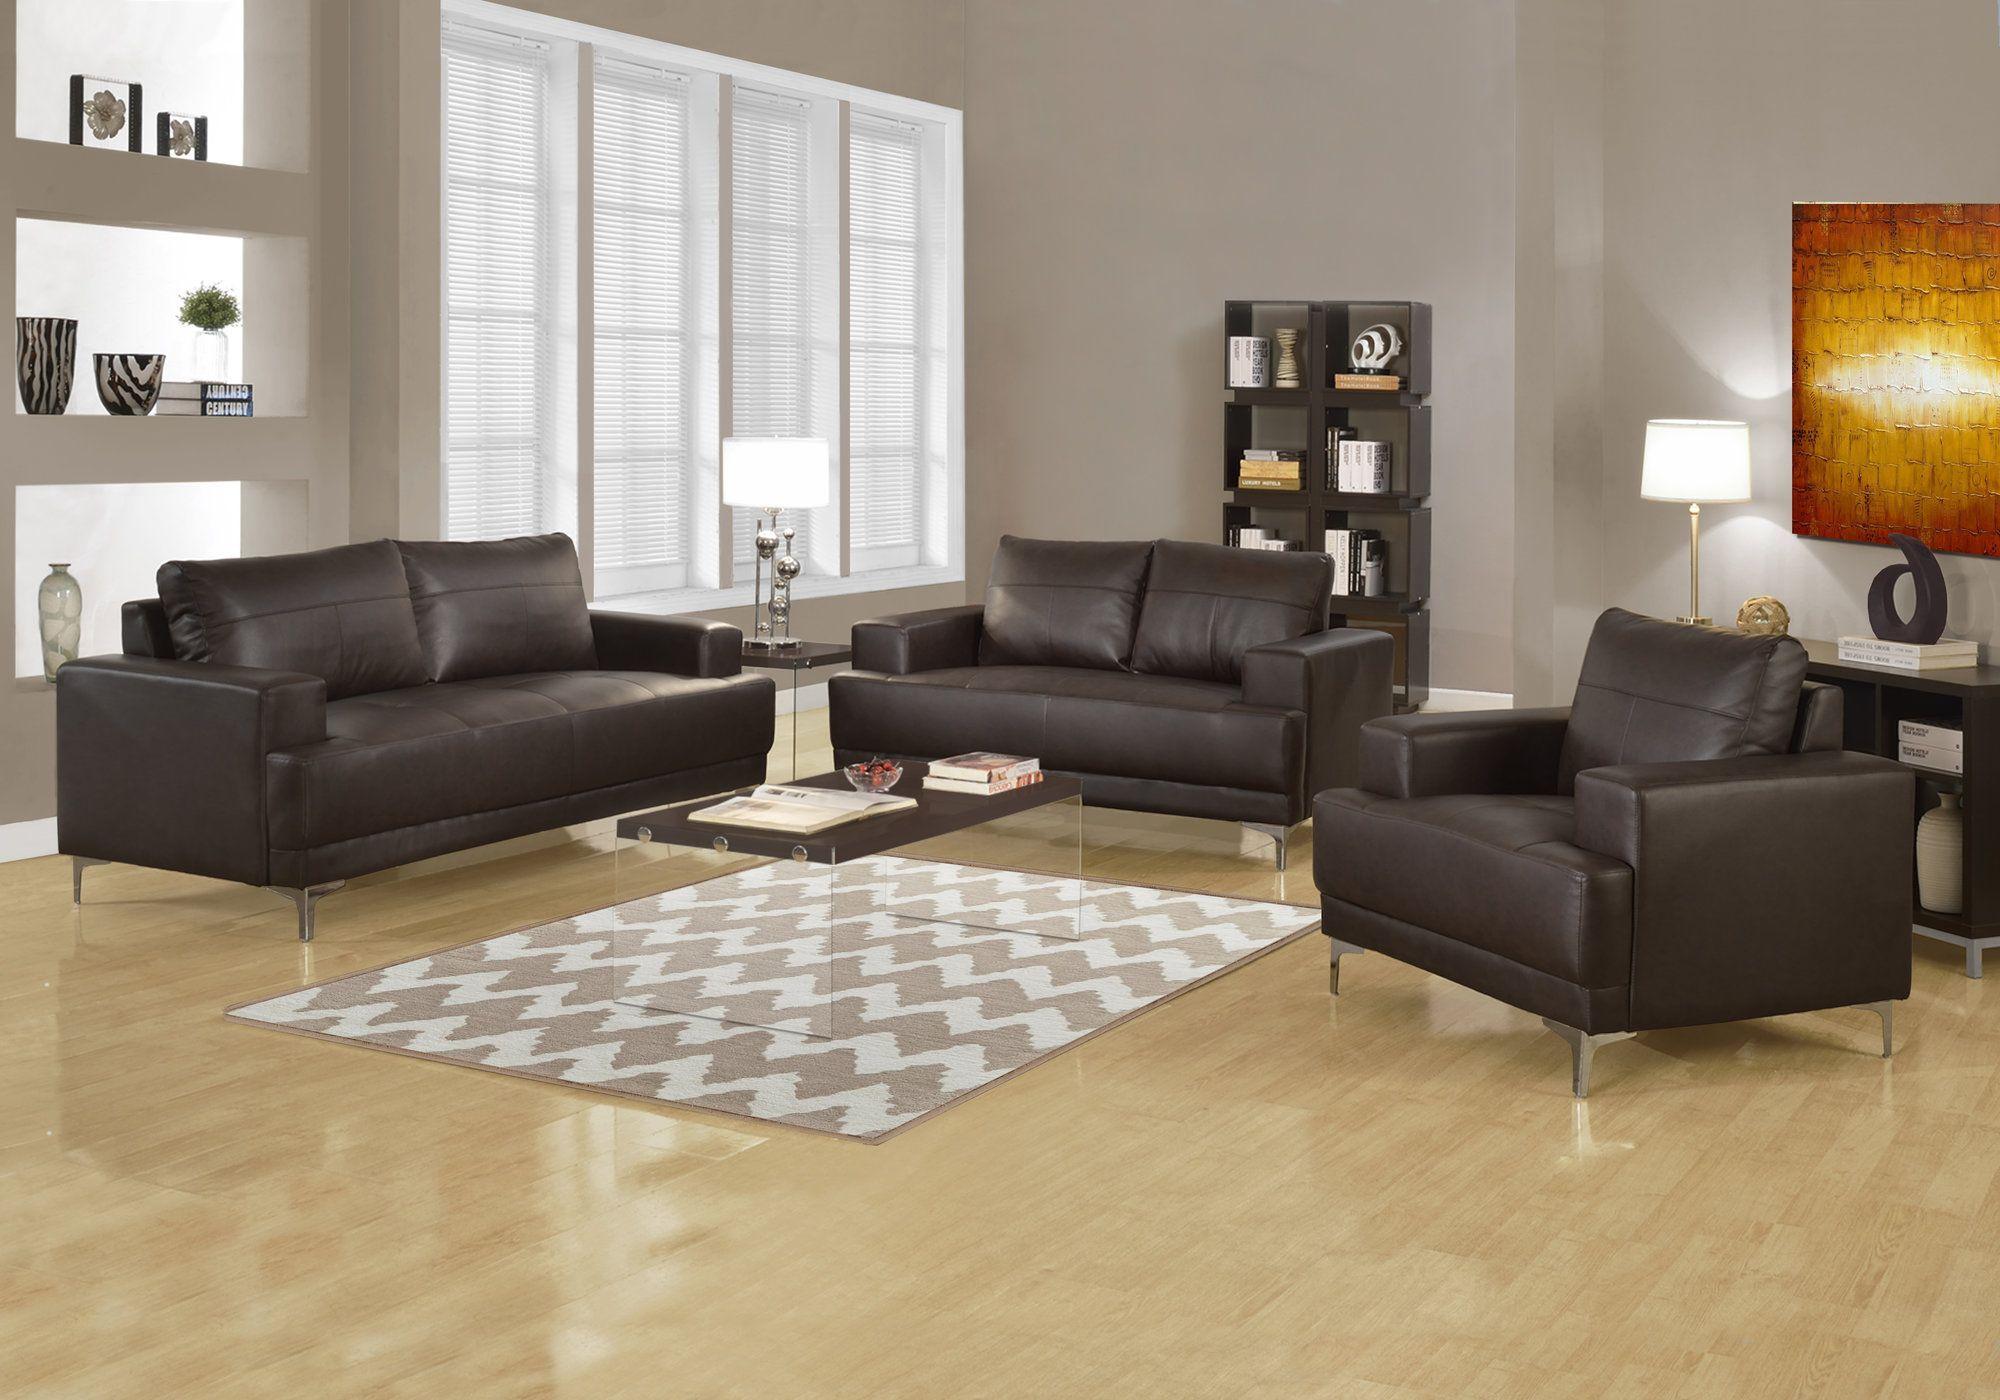 Accent Chair Dimensions: X X Love Seat Dimensions: X X Sofa Dimensions: X X